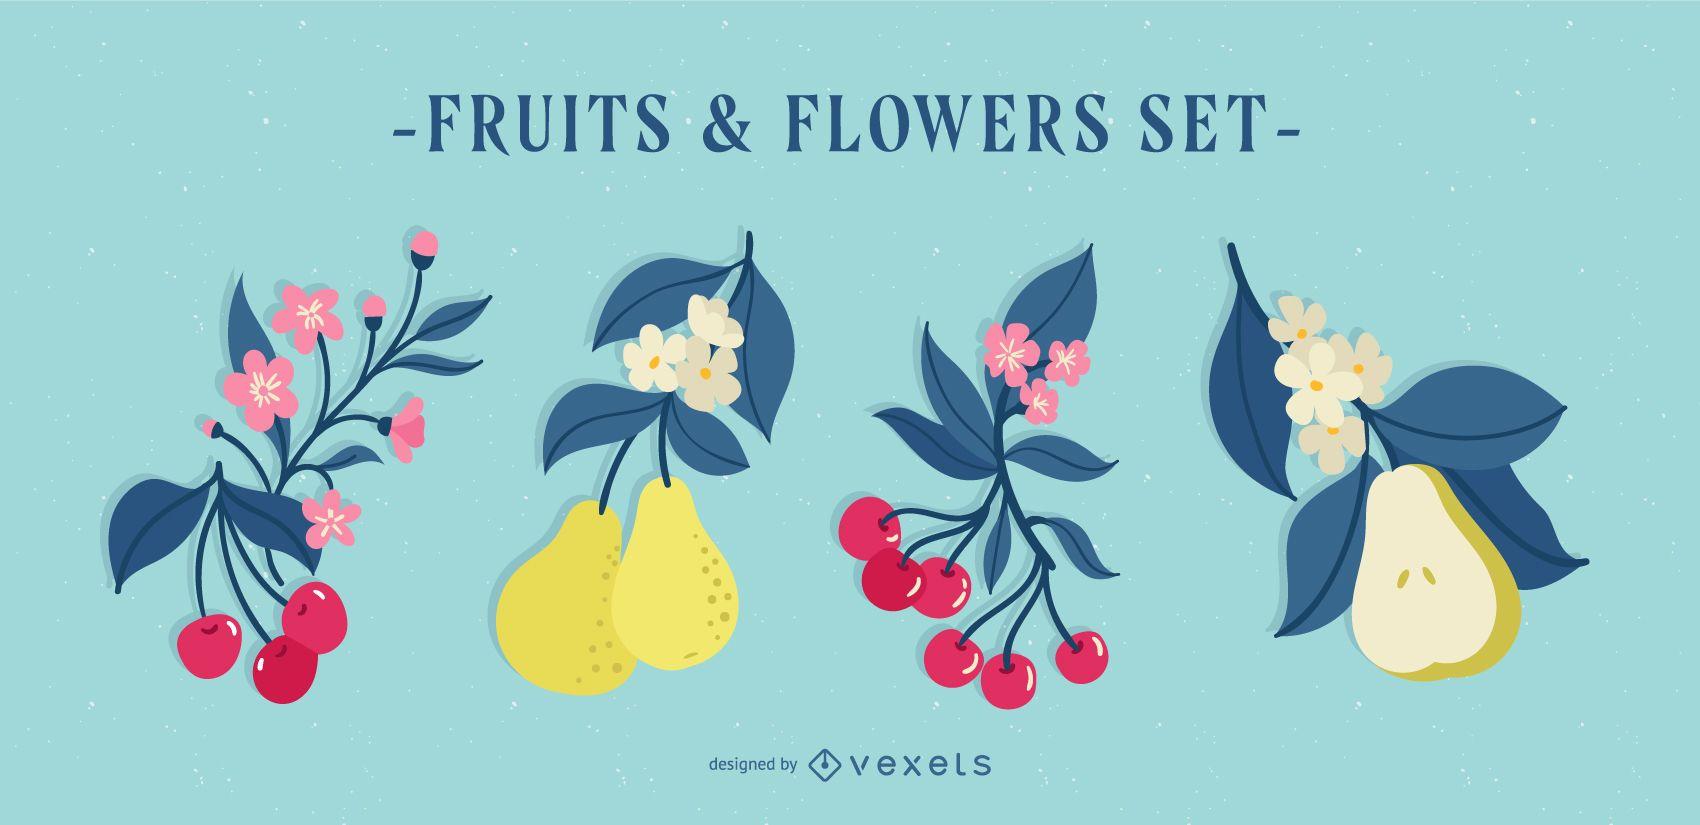 Fruits and flowers illustration set